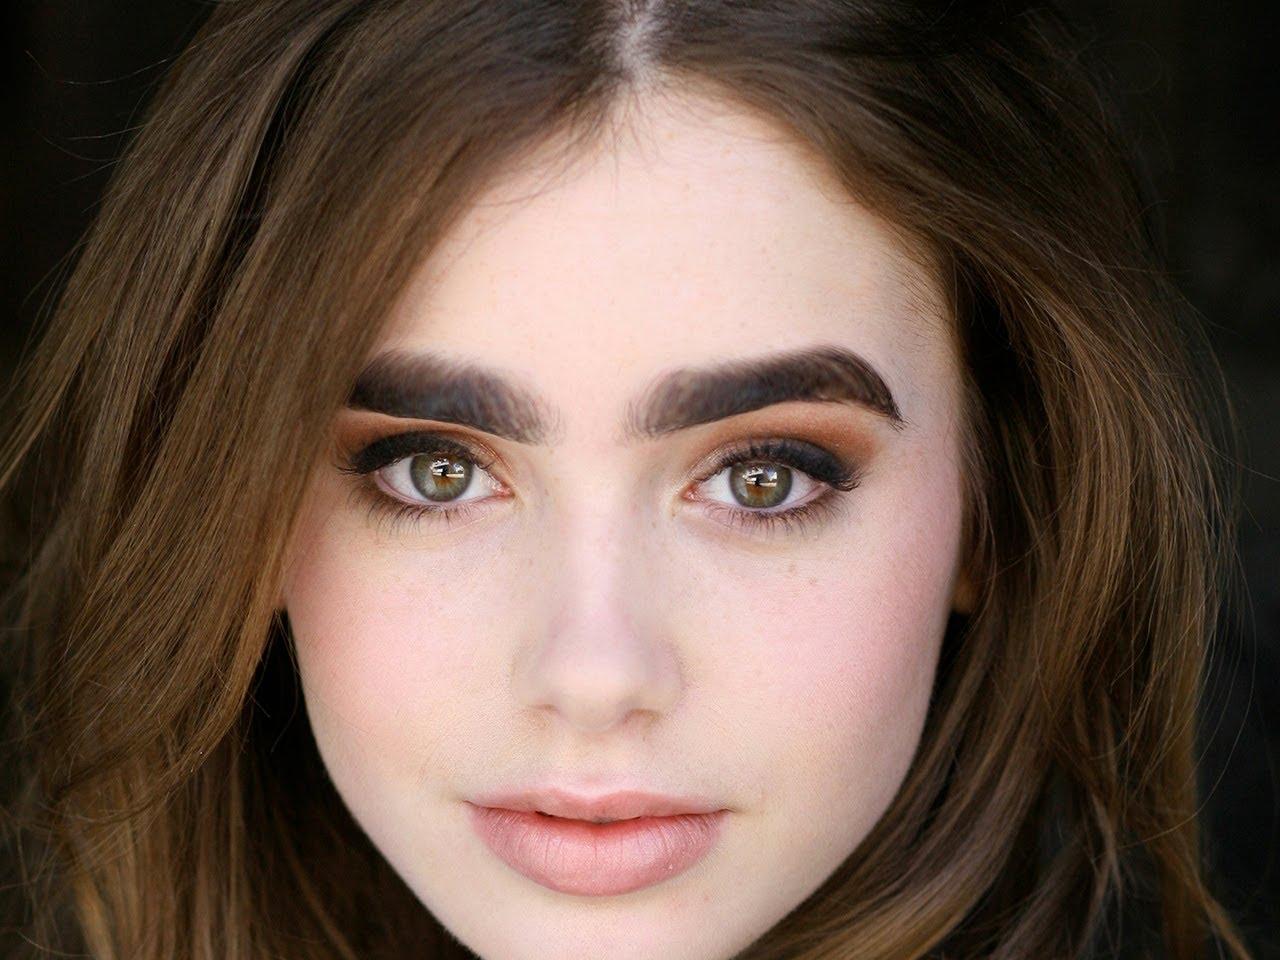 Taliyahs Eyebrows